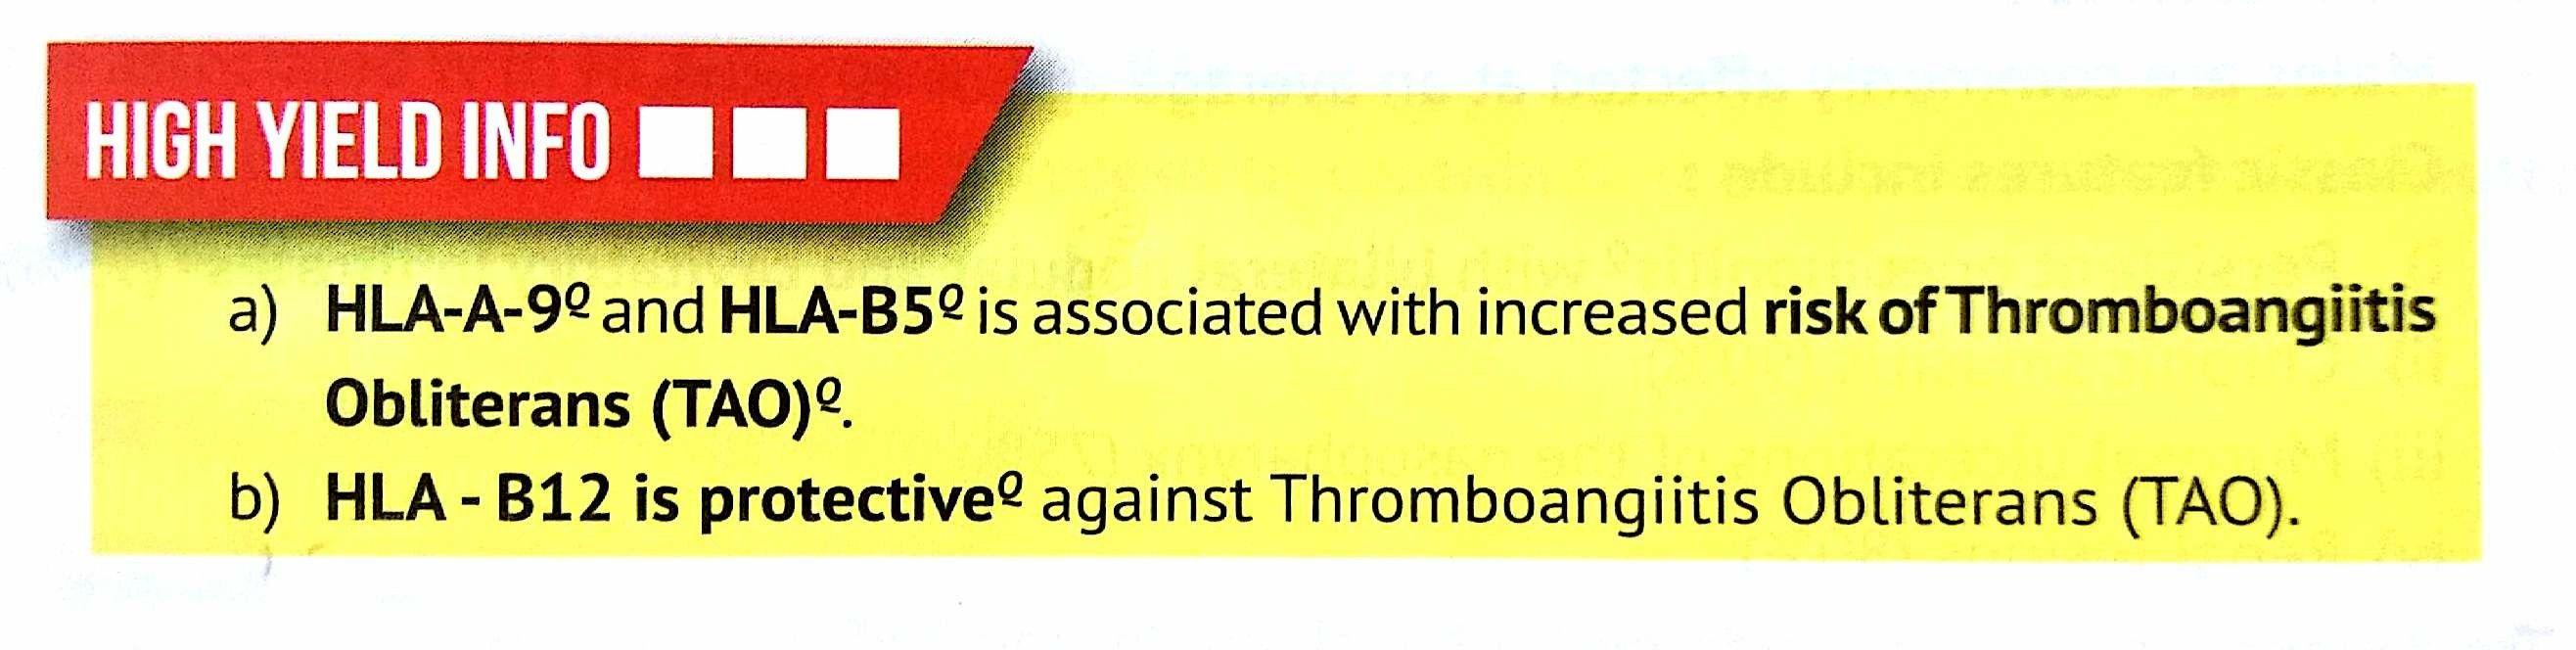 Hla And Risk Protection To Thrombangitis Obliterans Tao B12 Protective Like Vit B12 B12 Vit B12 Pathology